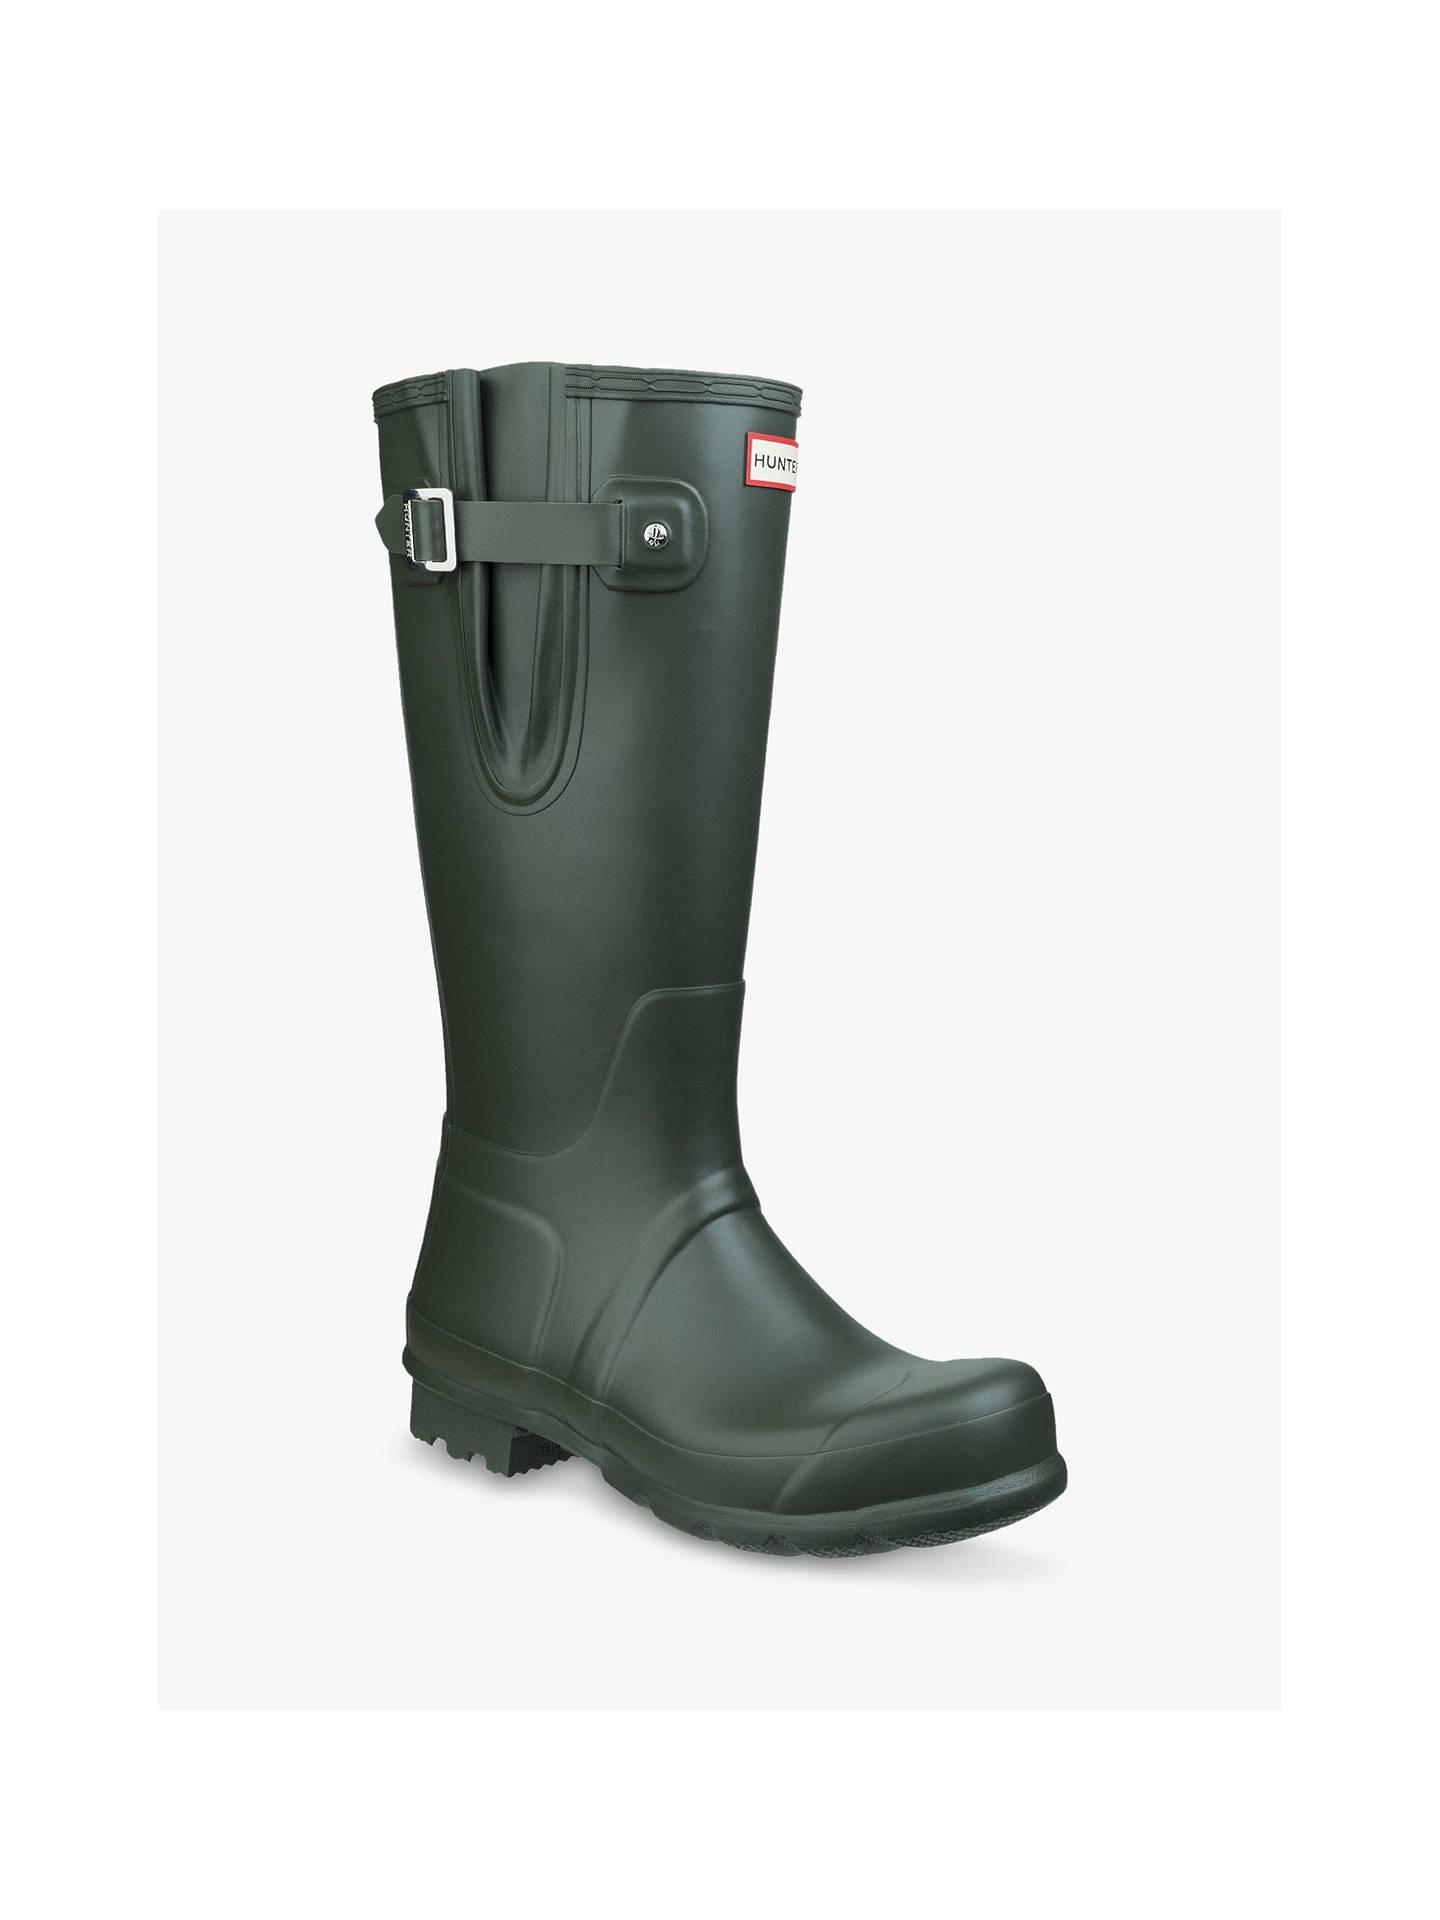 ... BuyHunter Boots Adjust Waterproof Wellington Boots, Dark Olive, 7 Online at johnlewis.com ...